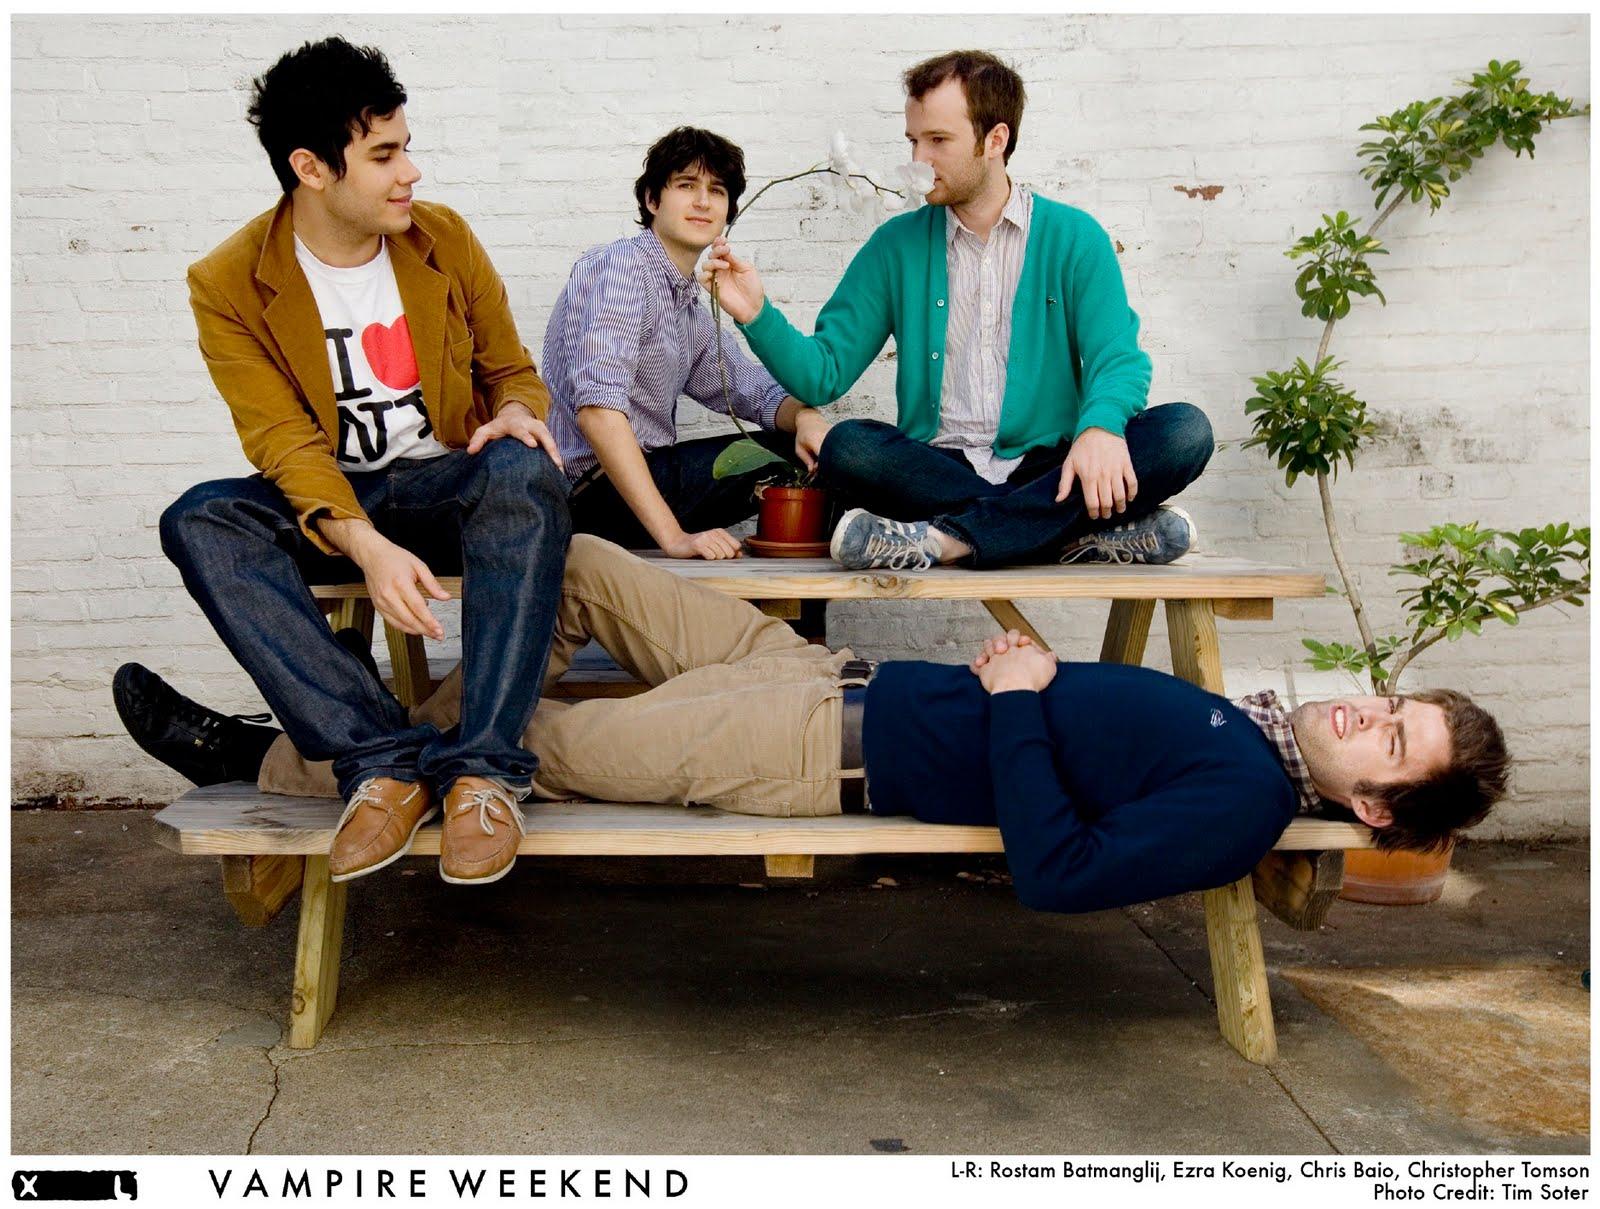 Get off my Lawn Kid: Bands That Suck Balls: VAMPIRE WEEKEND